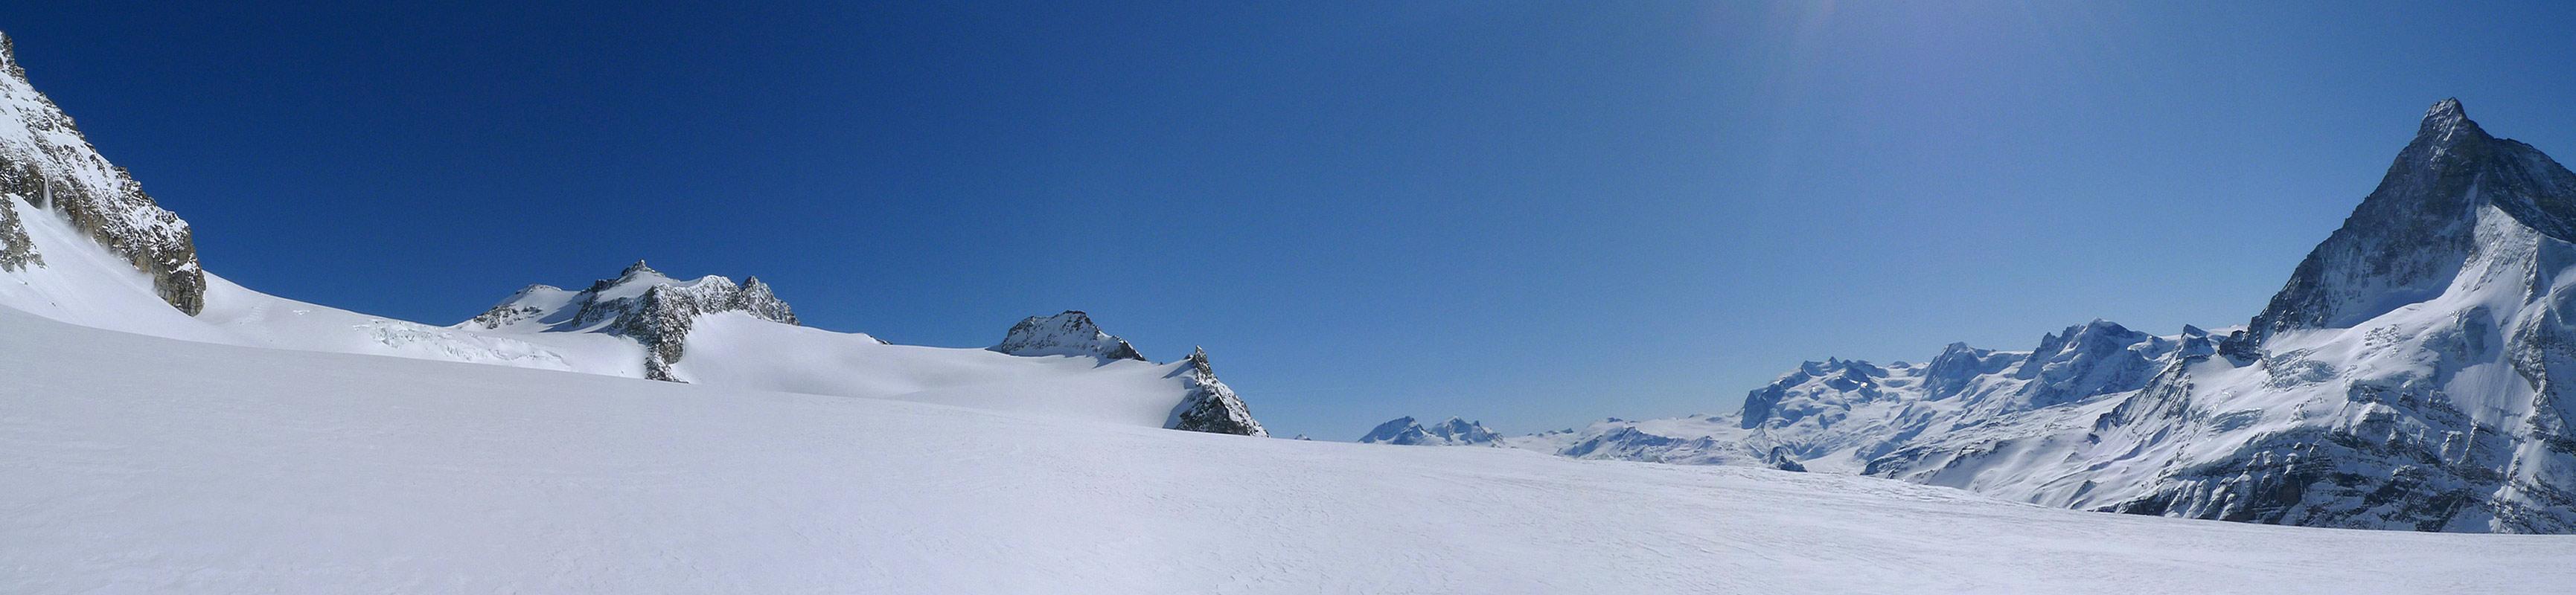 Mont Durand / Arbenhorn Walliser Alpen / Alpes valaisannes Switzerland panorama 45